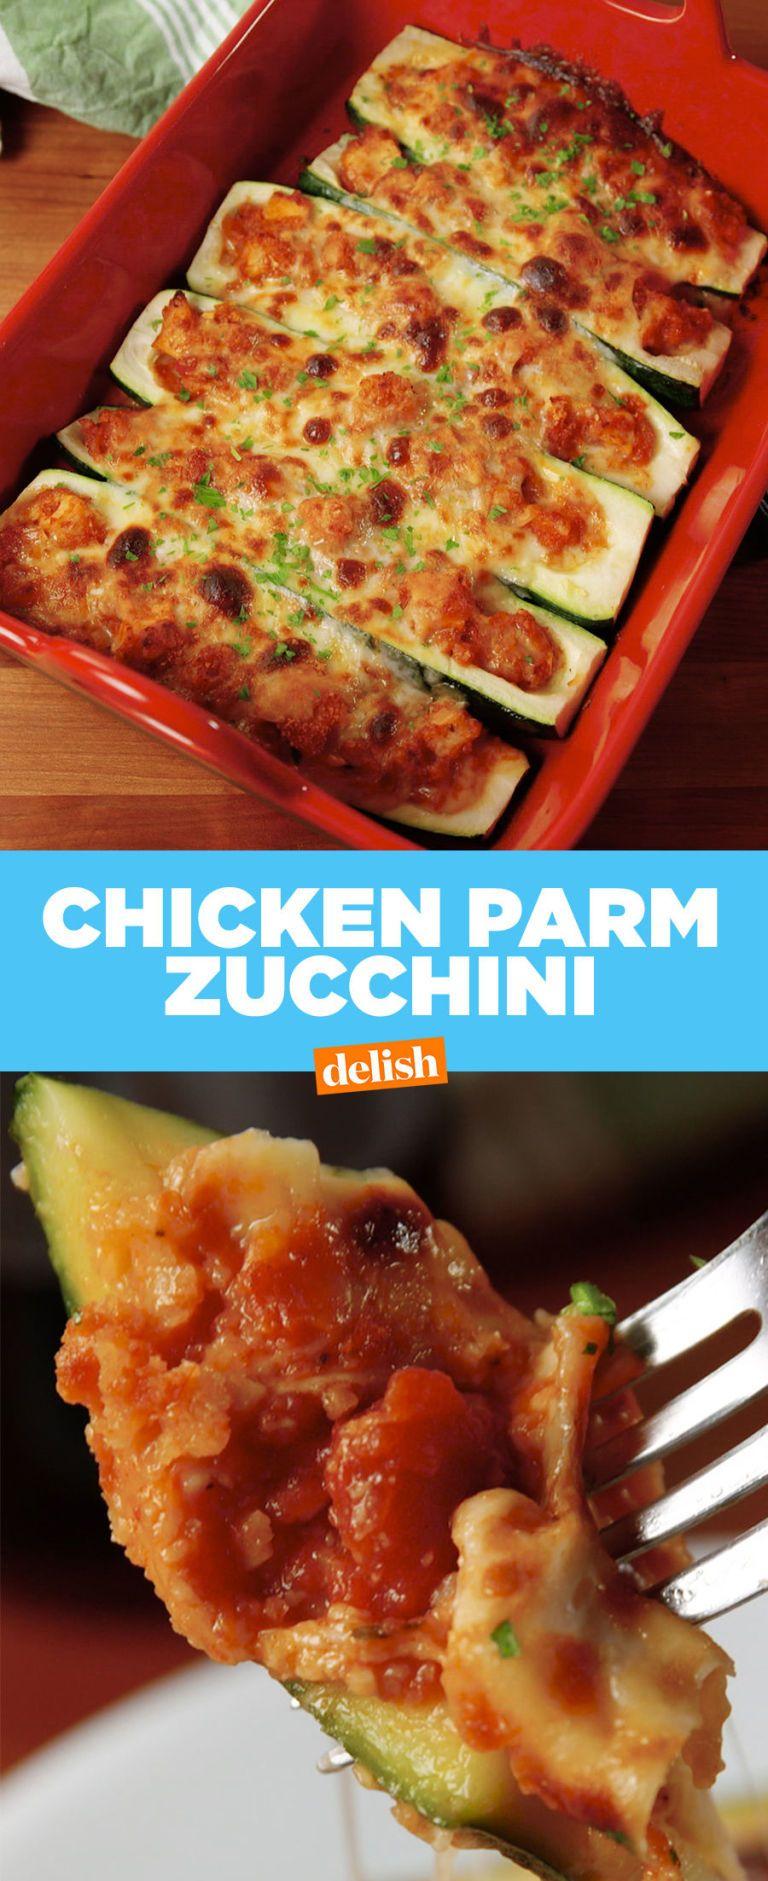 Zuchini Boats Baking Recipes